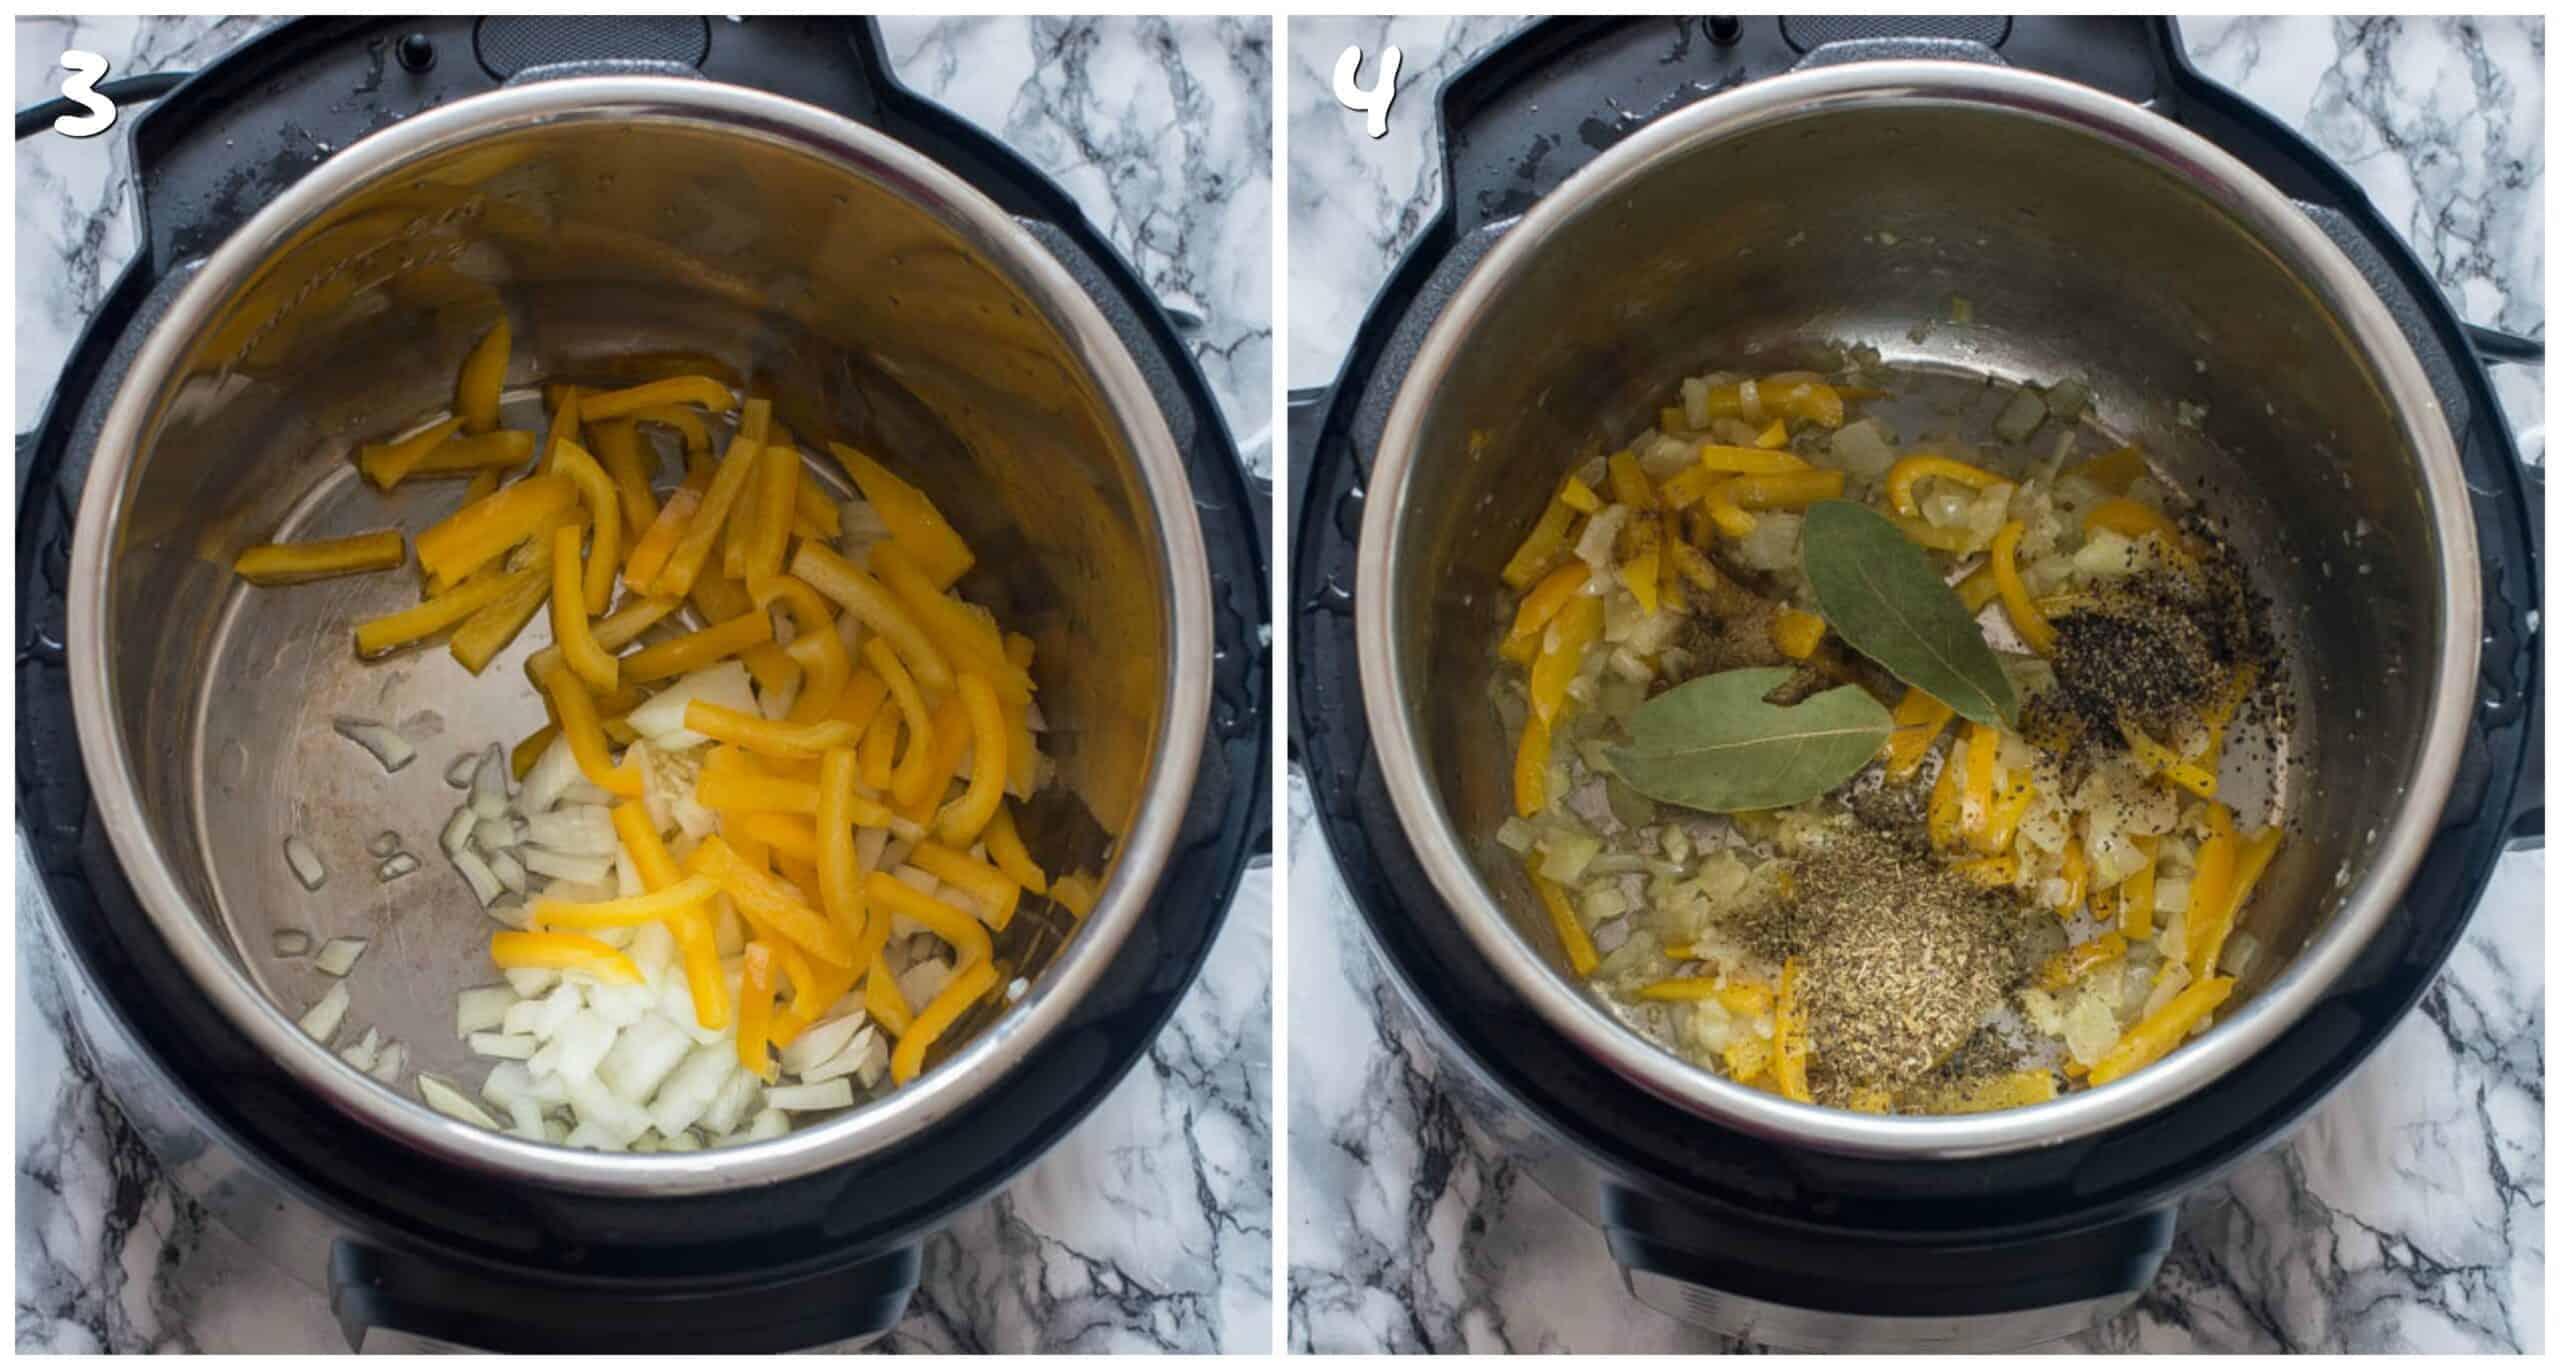 steps 3-4 sauteing vegetables and seasoning